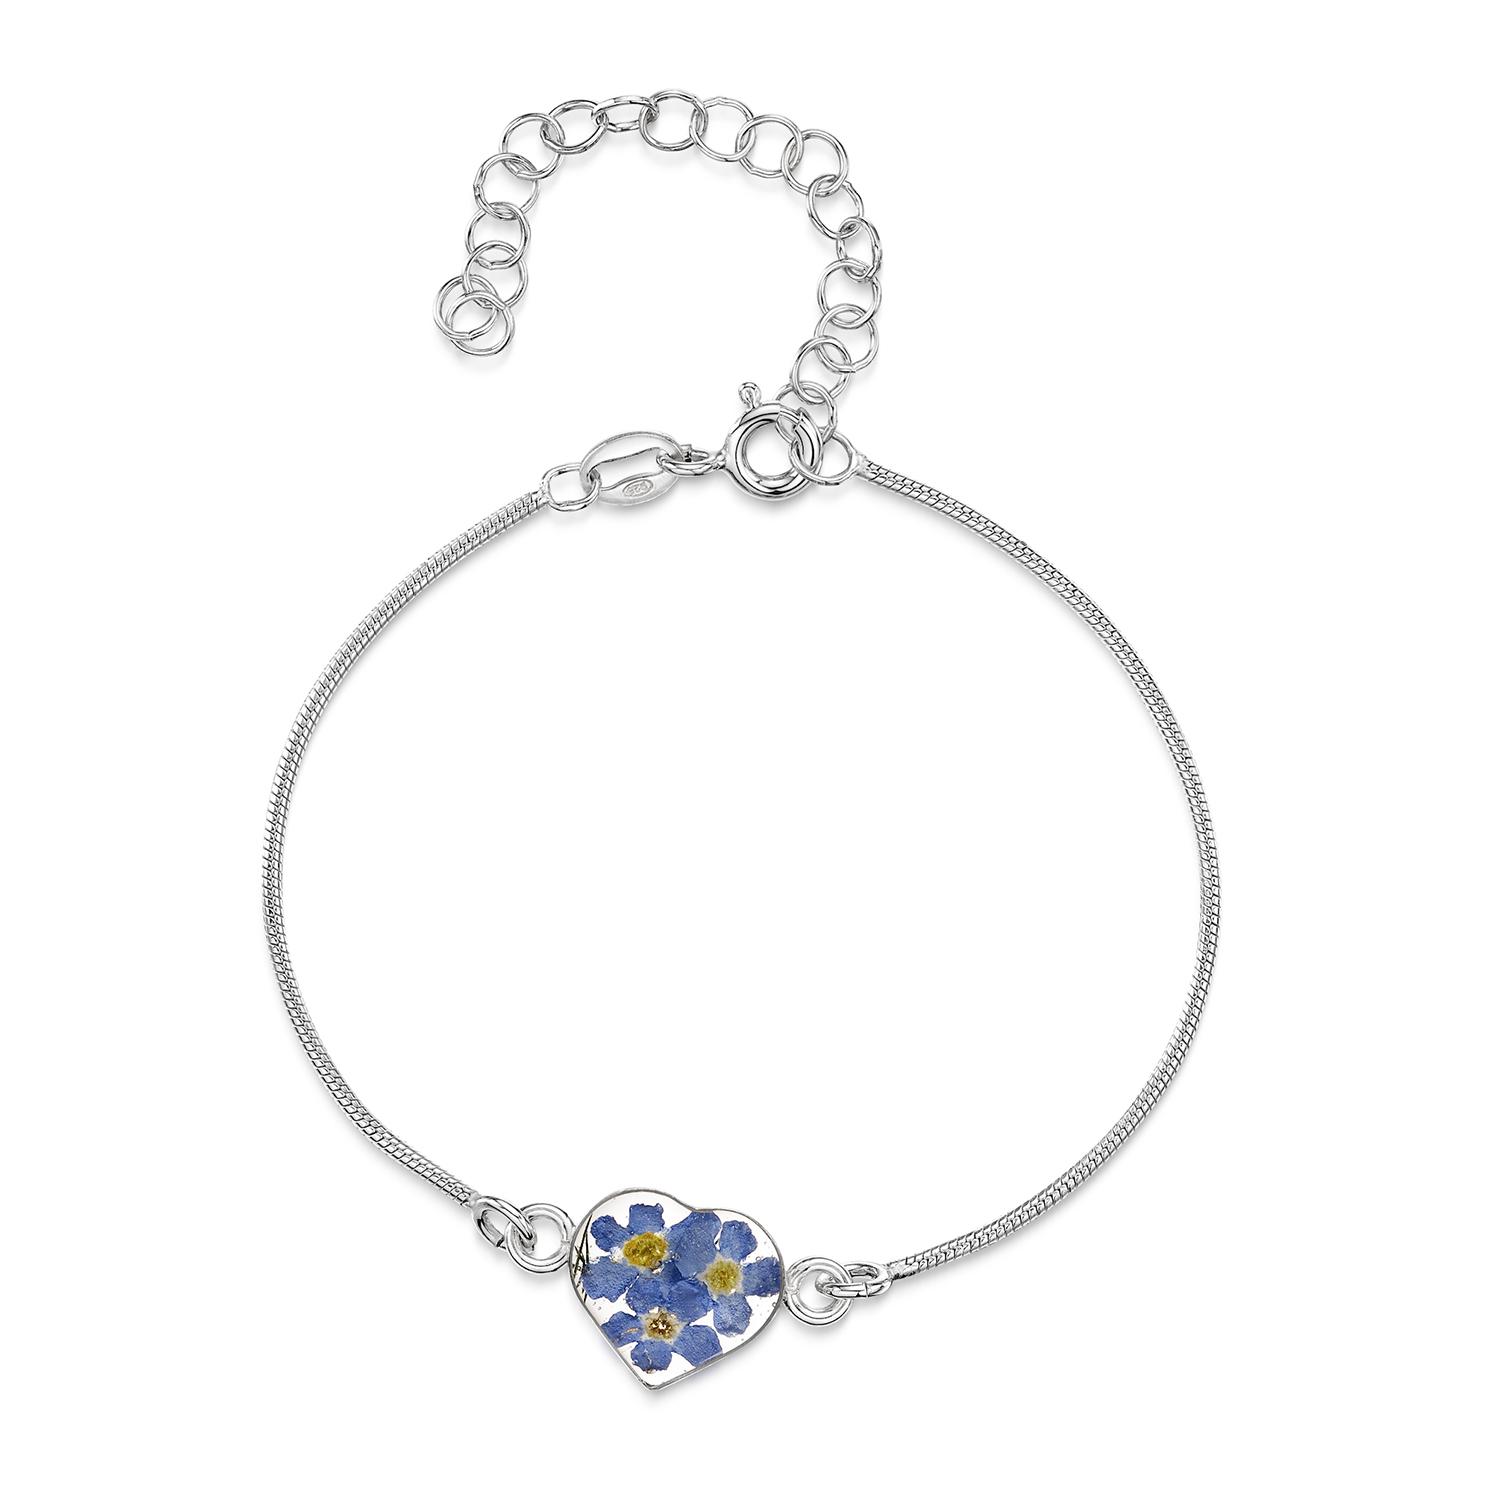 Shrieking Violet – Forget-me-not Silver Snake Heart Charm Bracelet in Gift Box